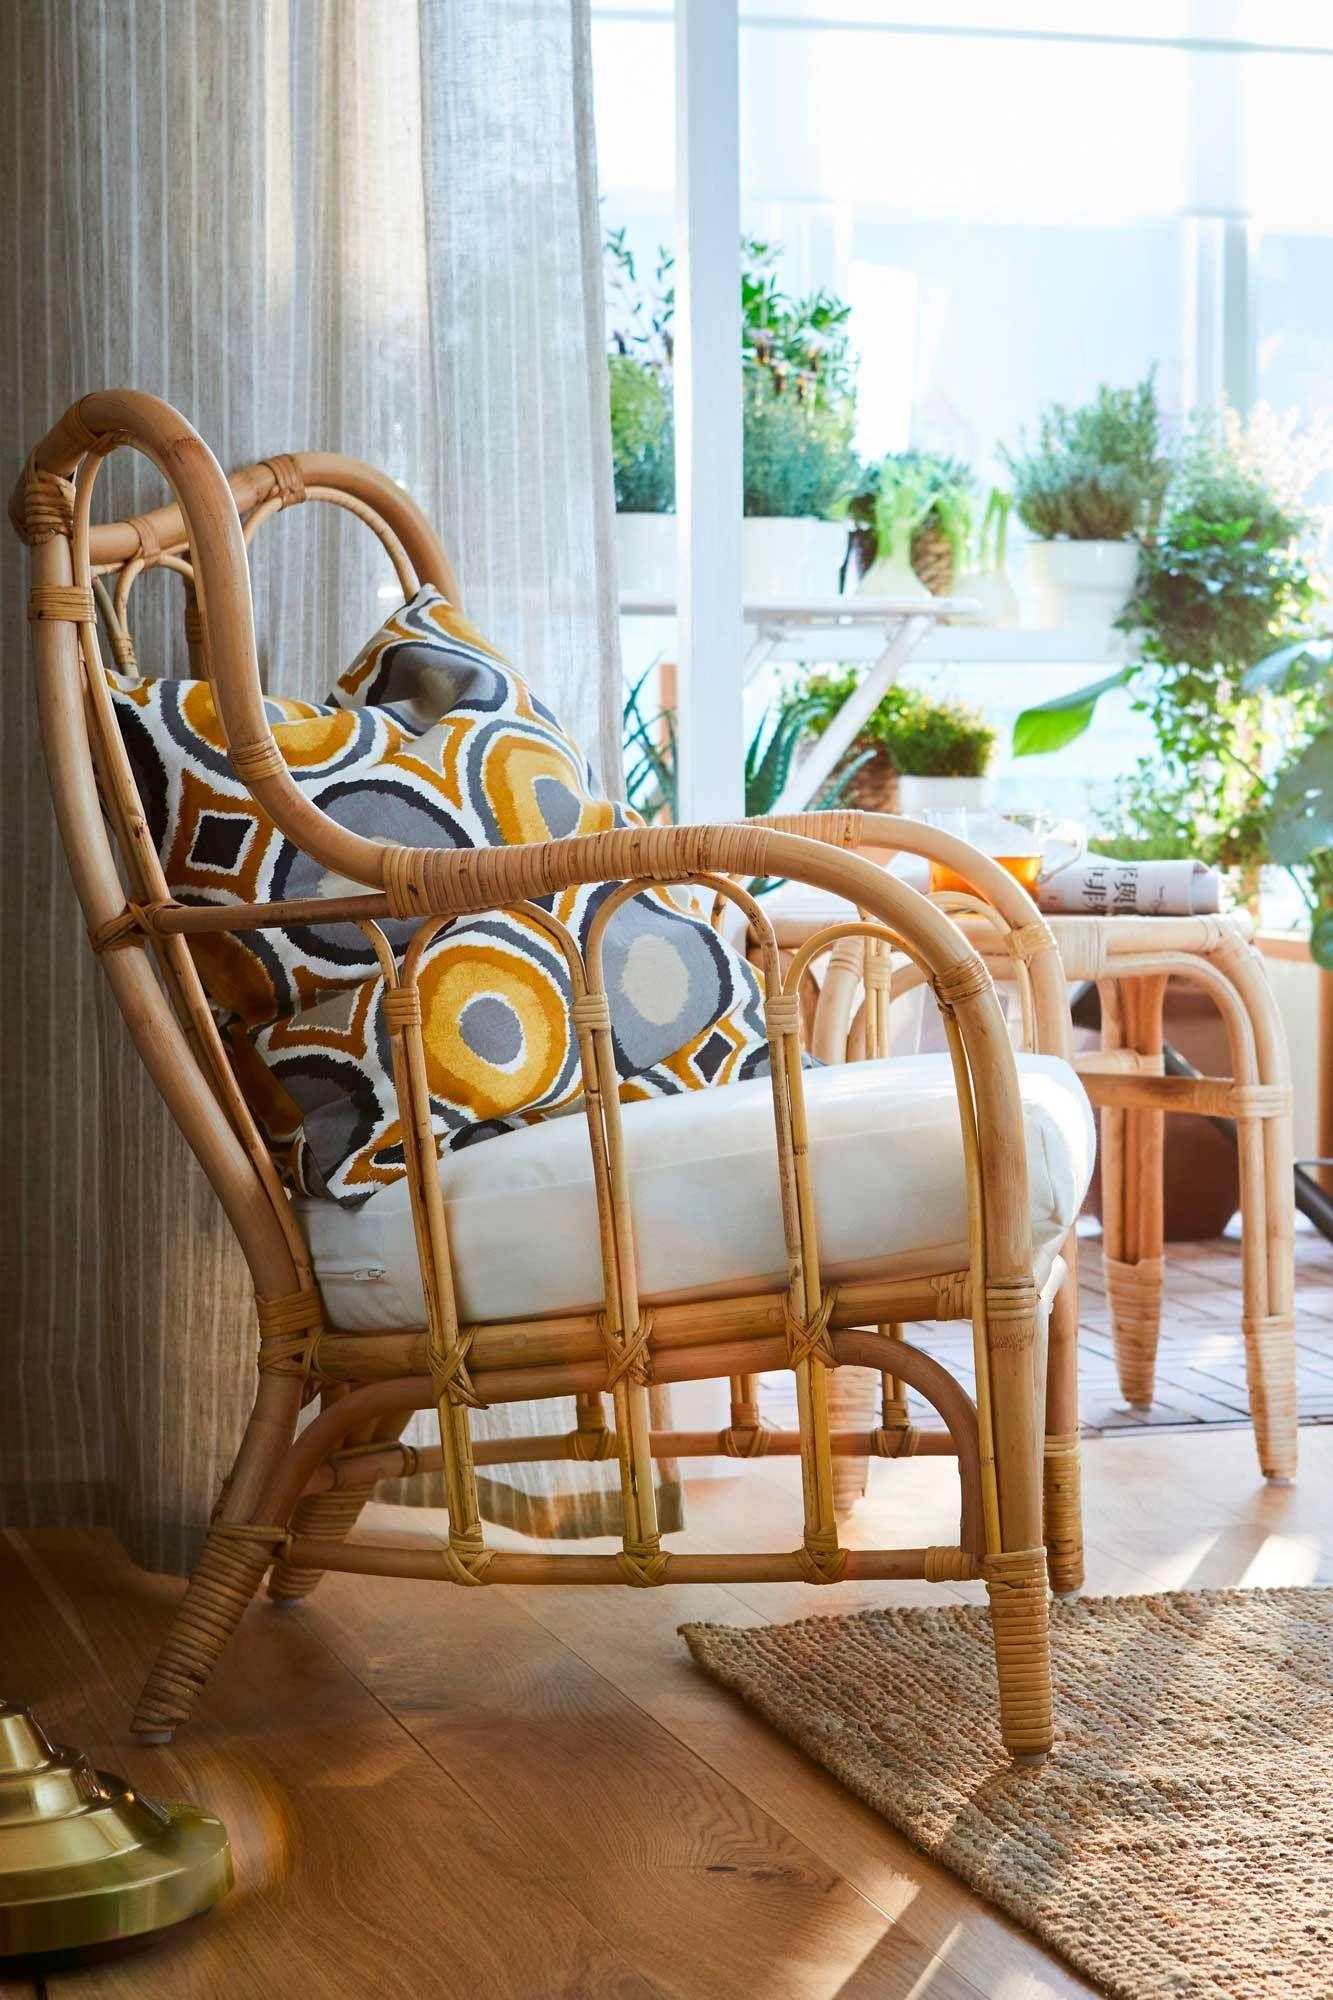 Atrevete Con Complementos Textiles Furry Decoracion De Muebles Ikea Butacas